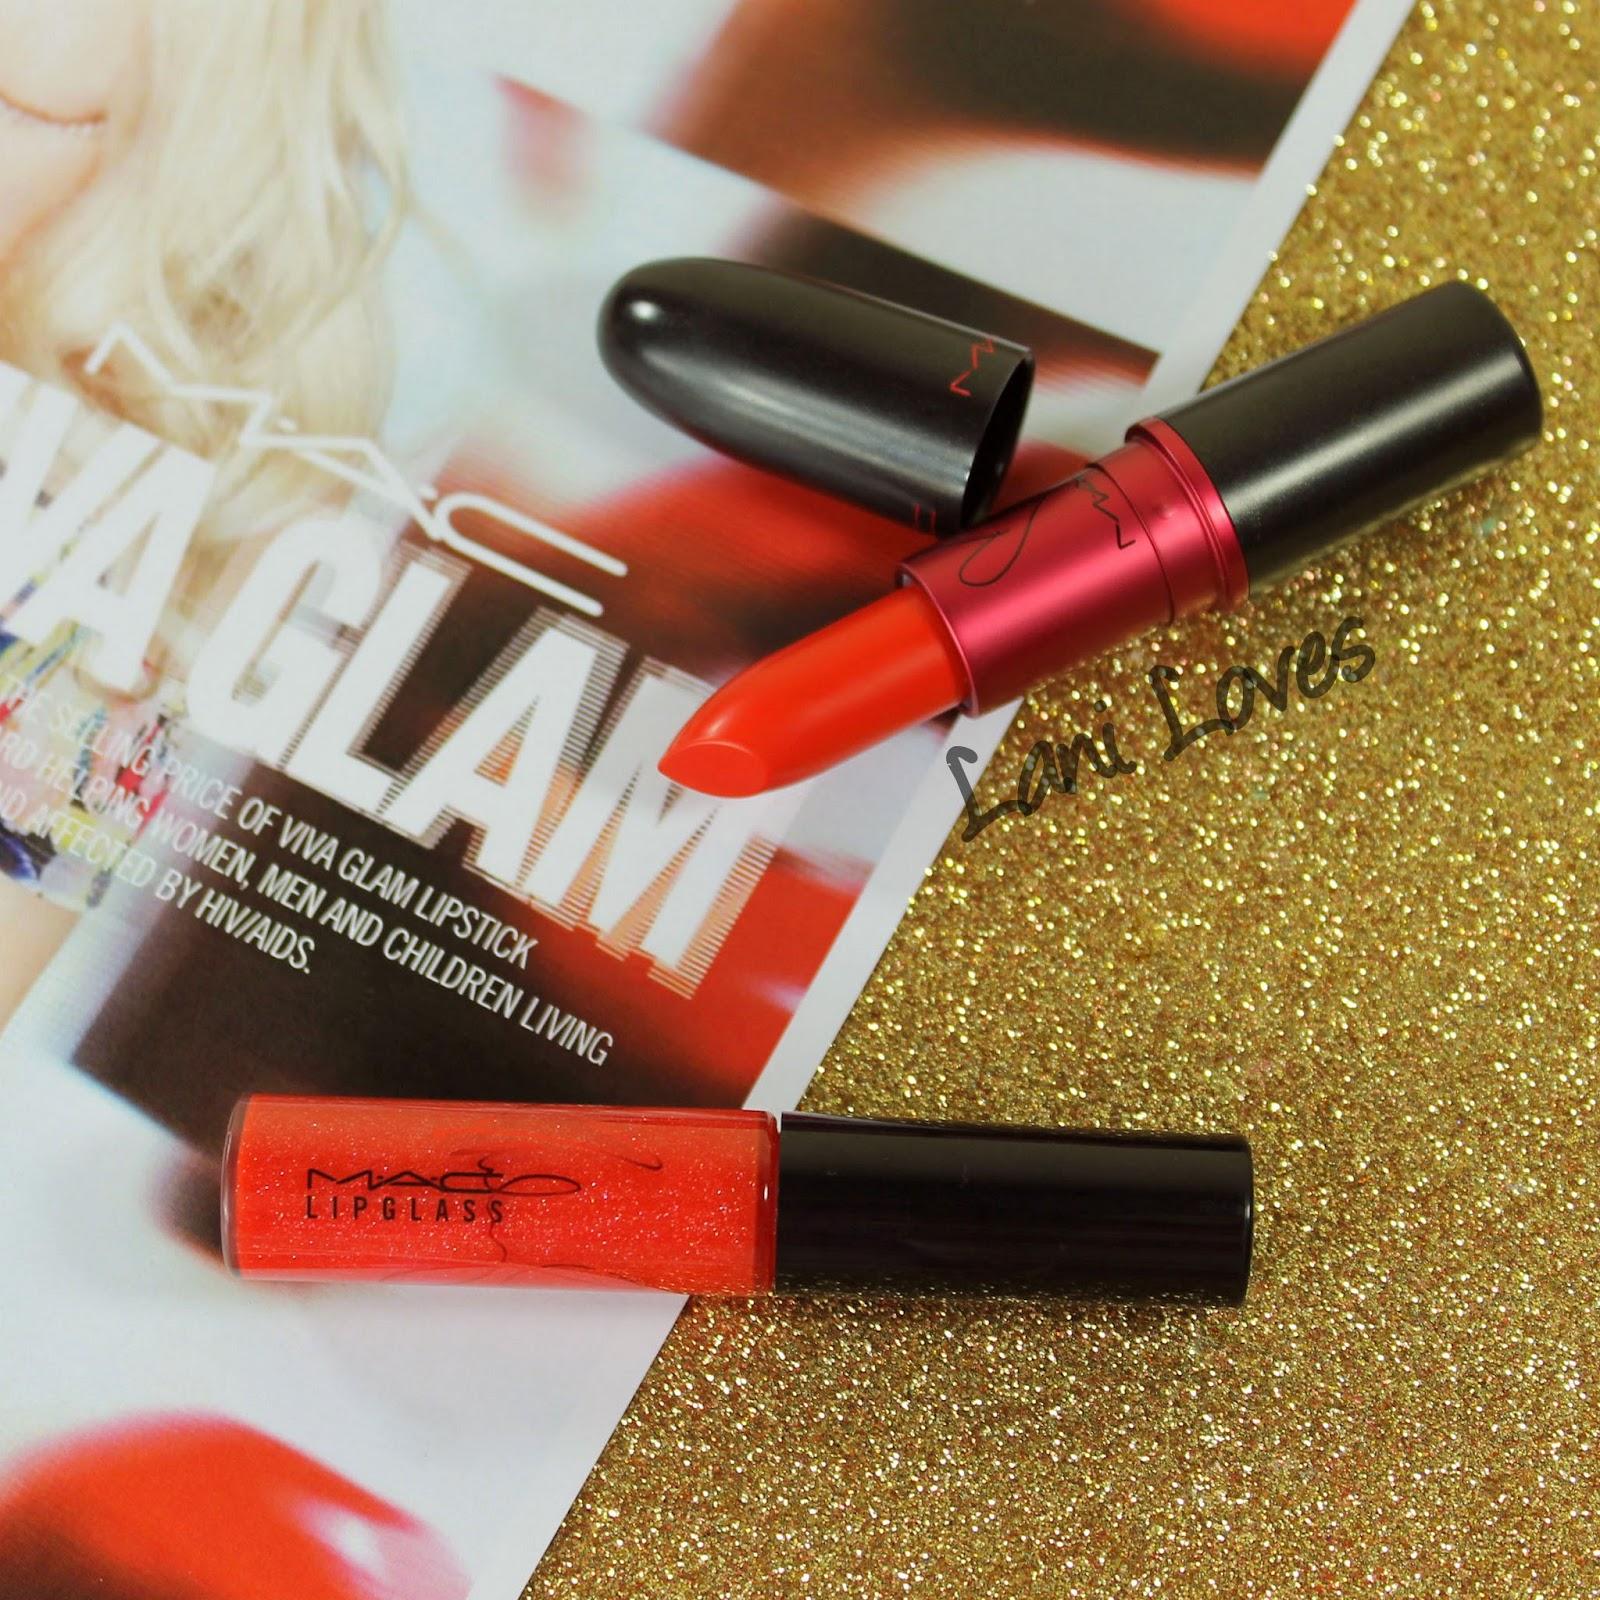 MAC Viva Glam Miley Cyrus 1 & 2 Lipstick and Lipglass ...